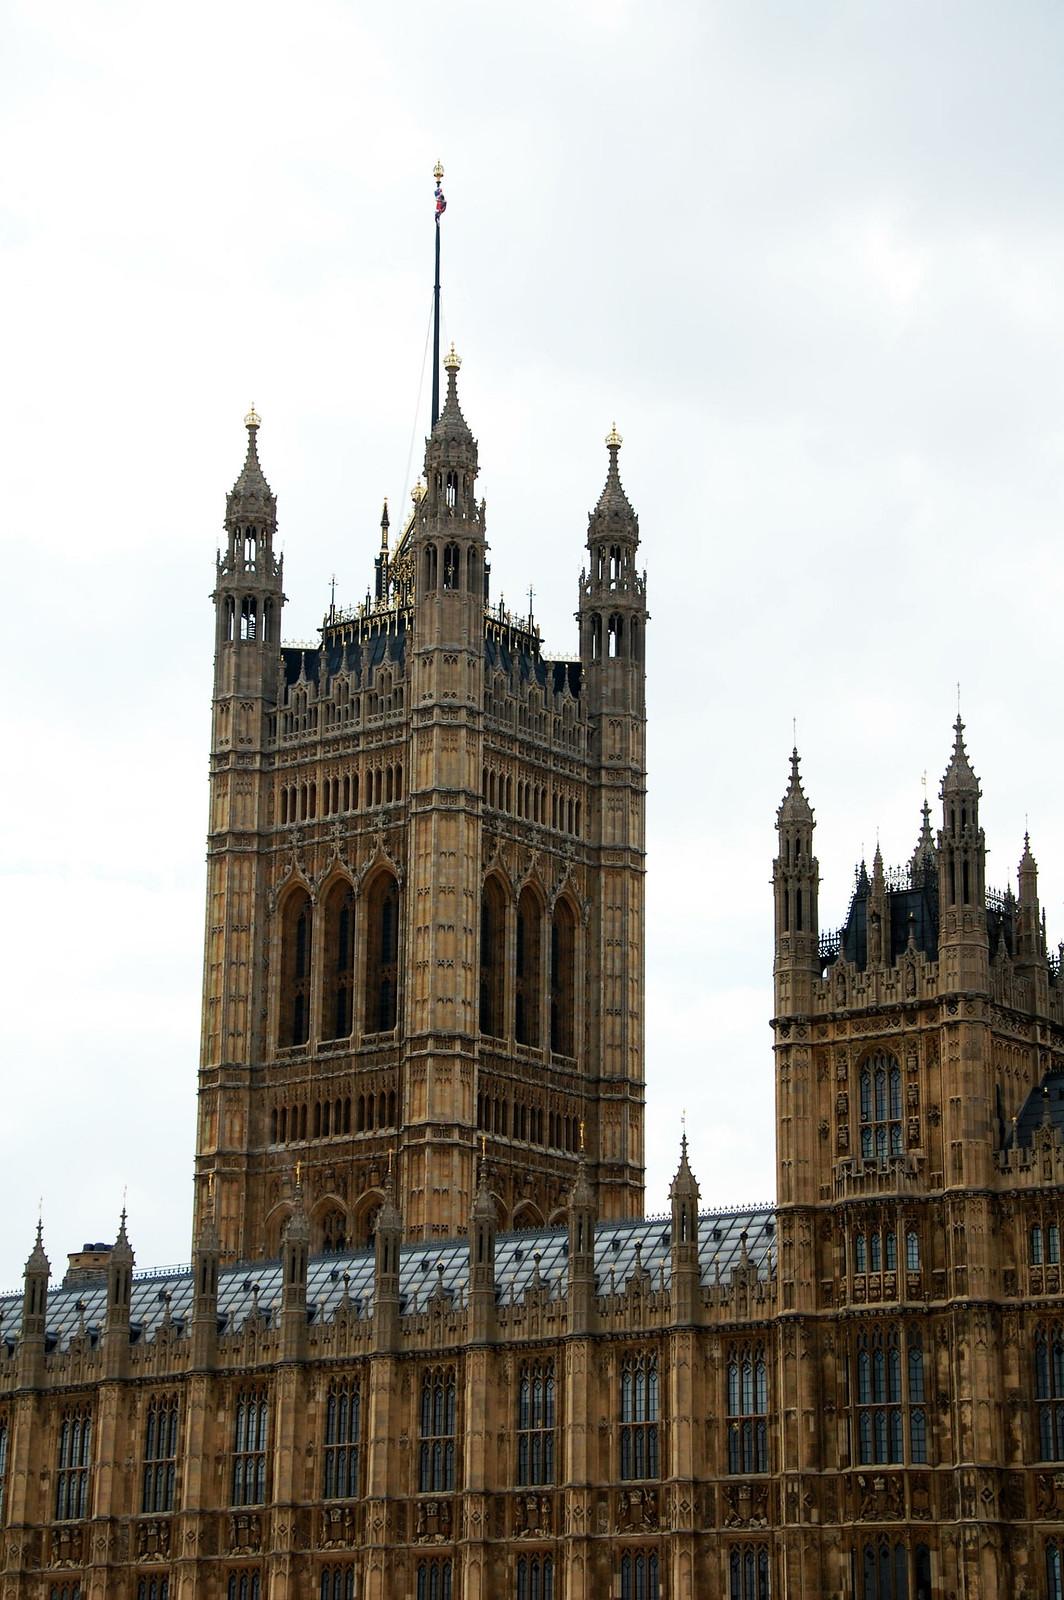 Parliment-London-embankment